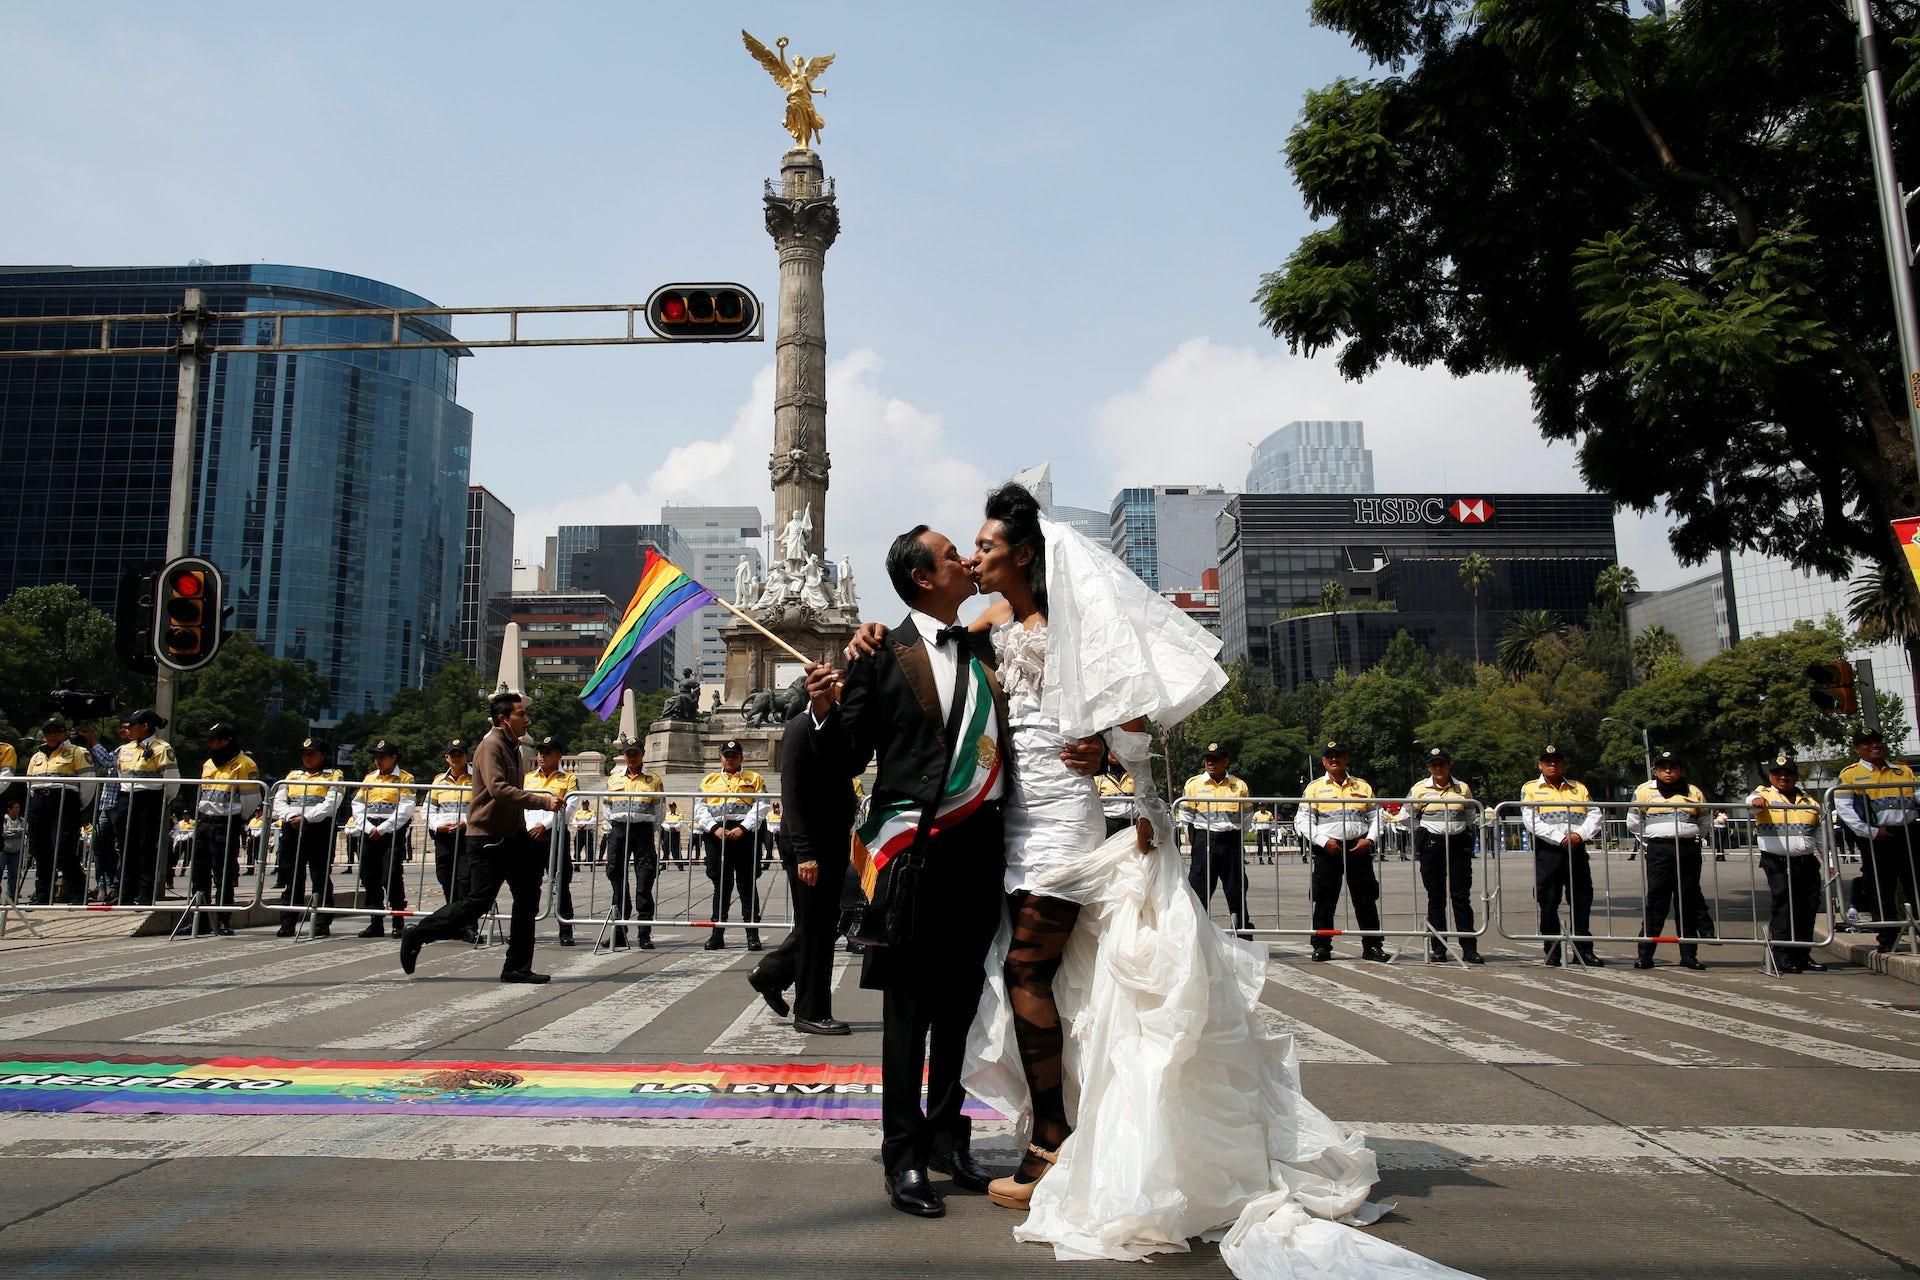 Gohou ma famille le marriage homosexual marriage